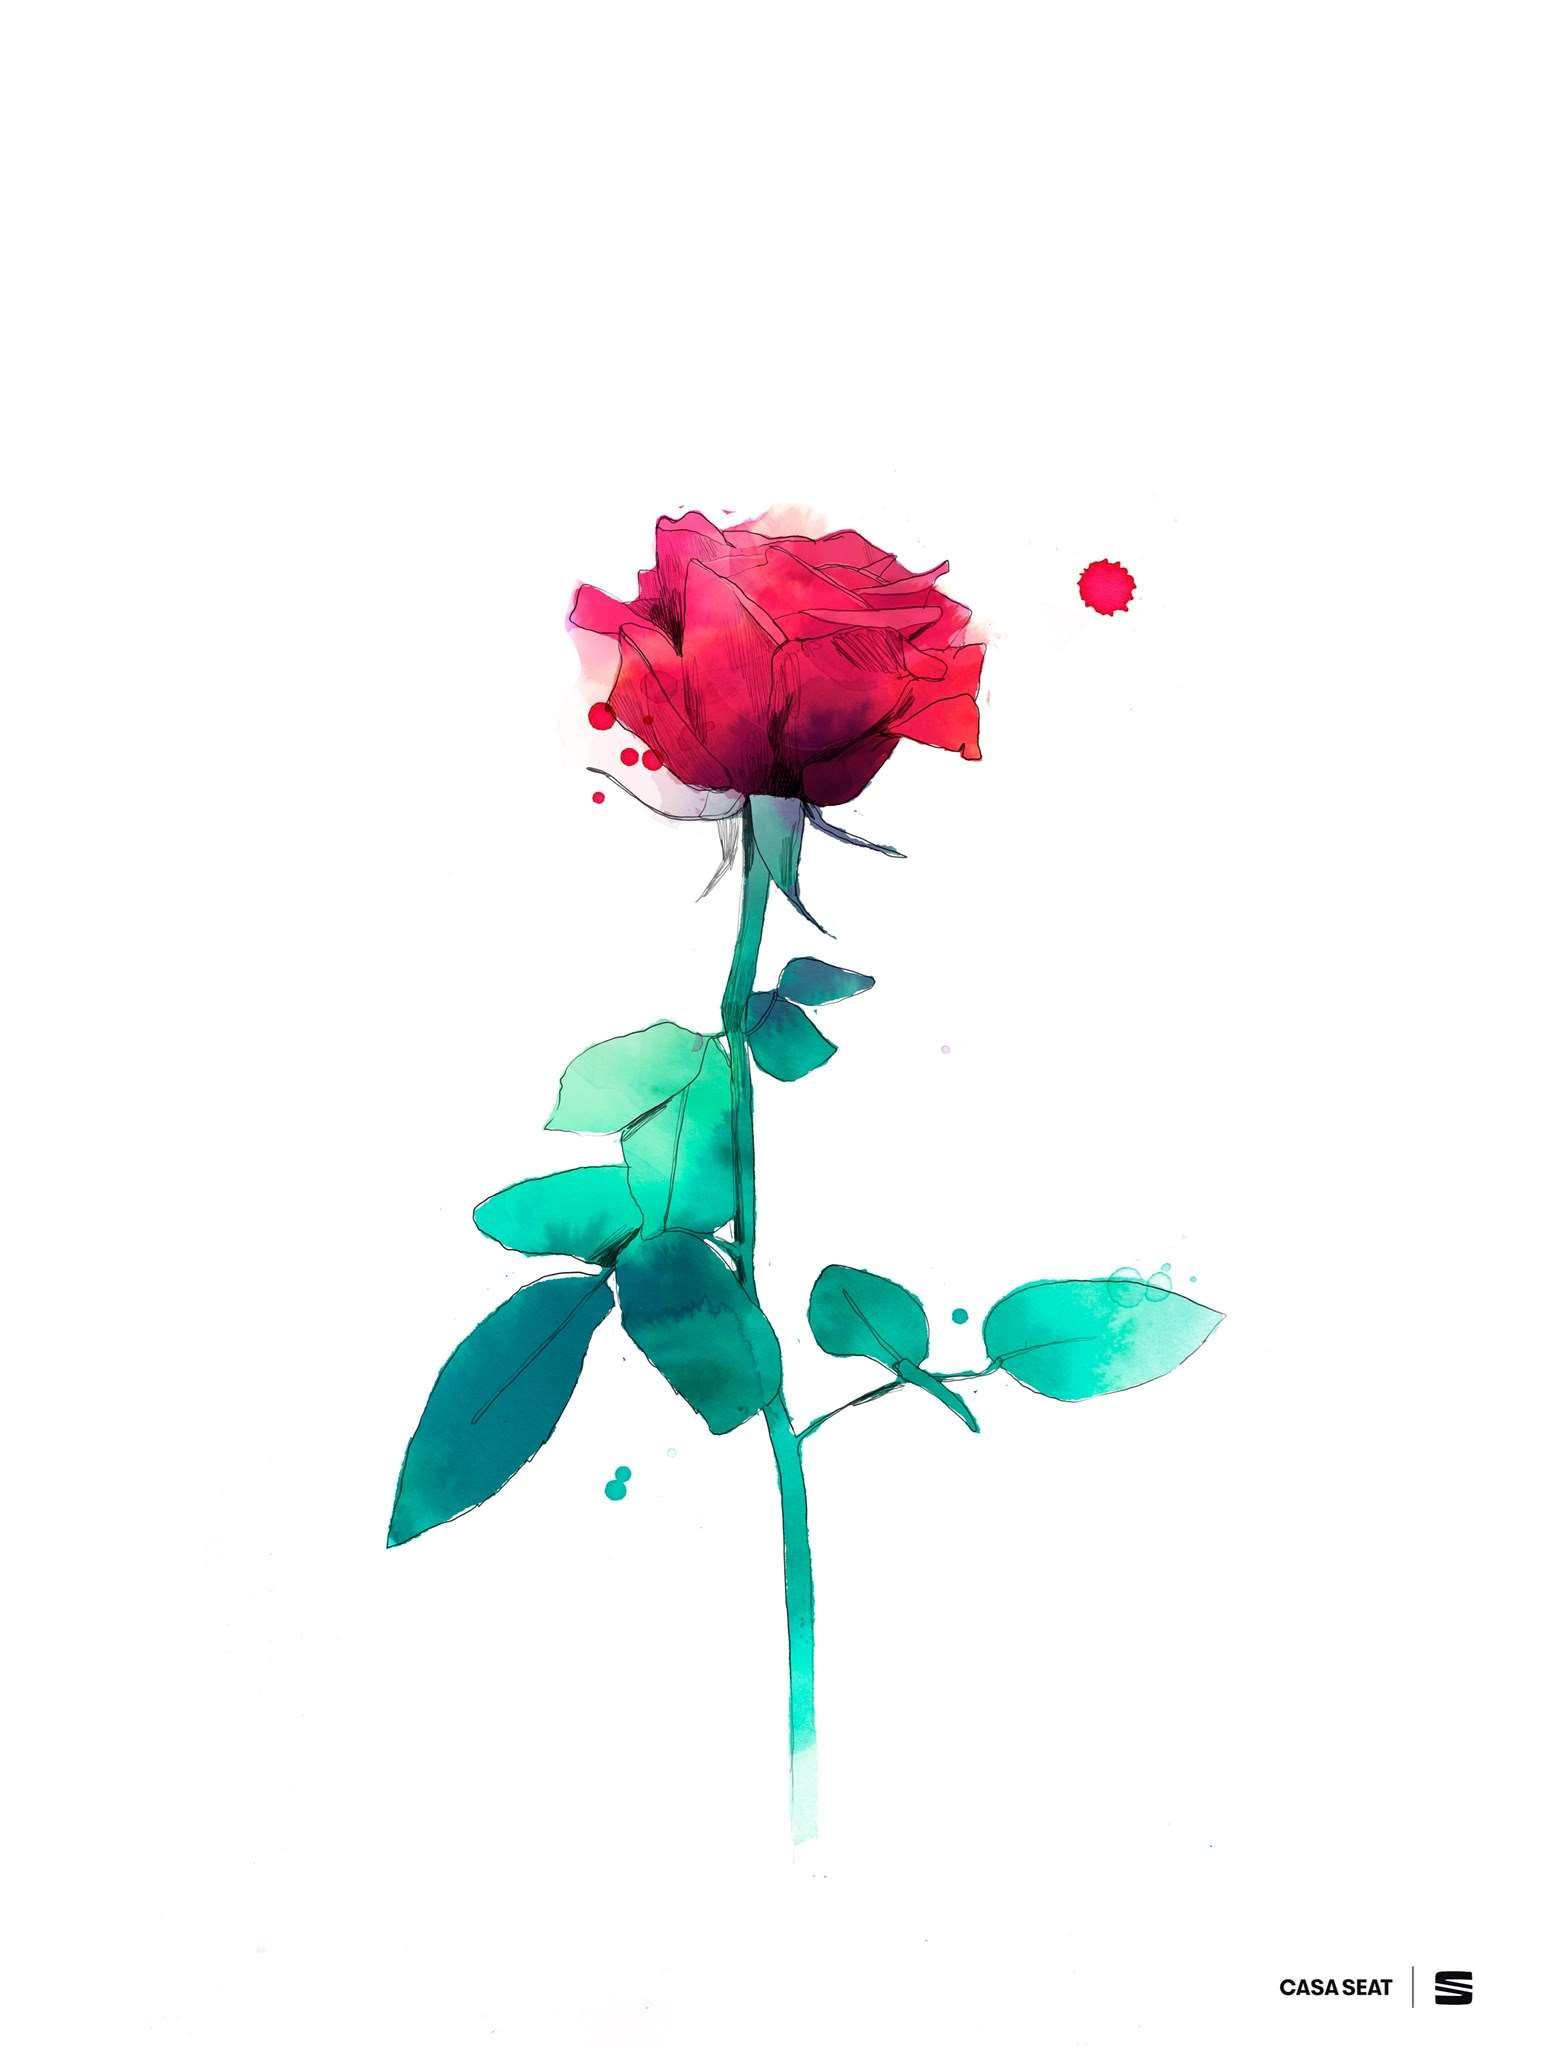 La rosa virtual de Casa Seat